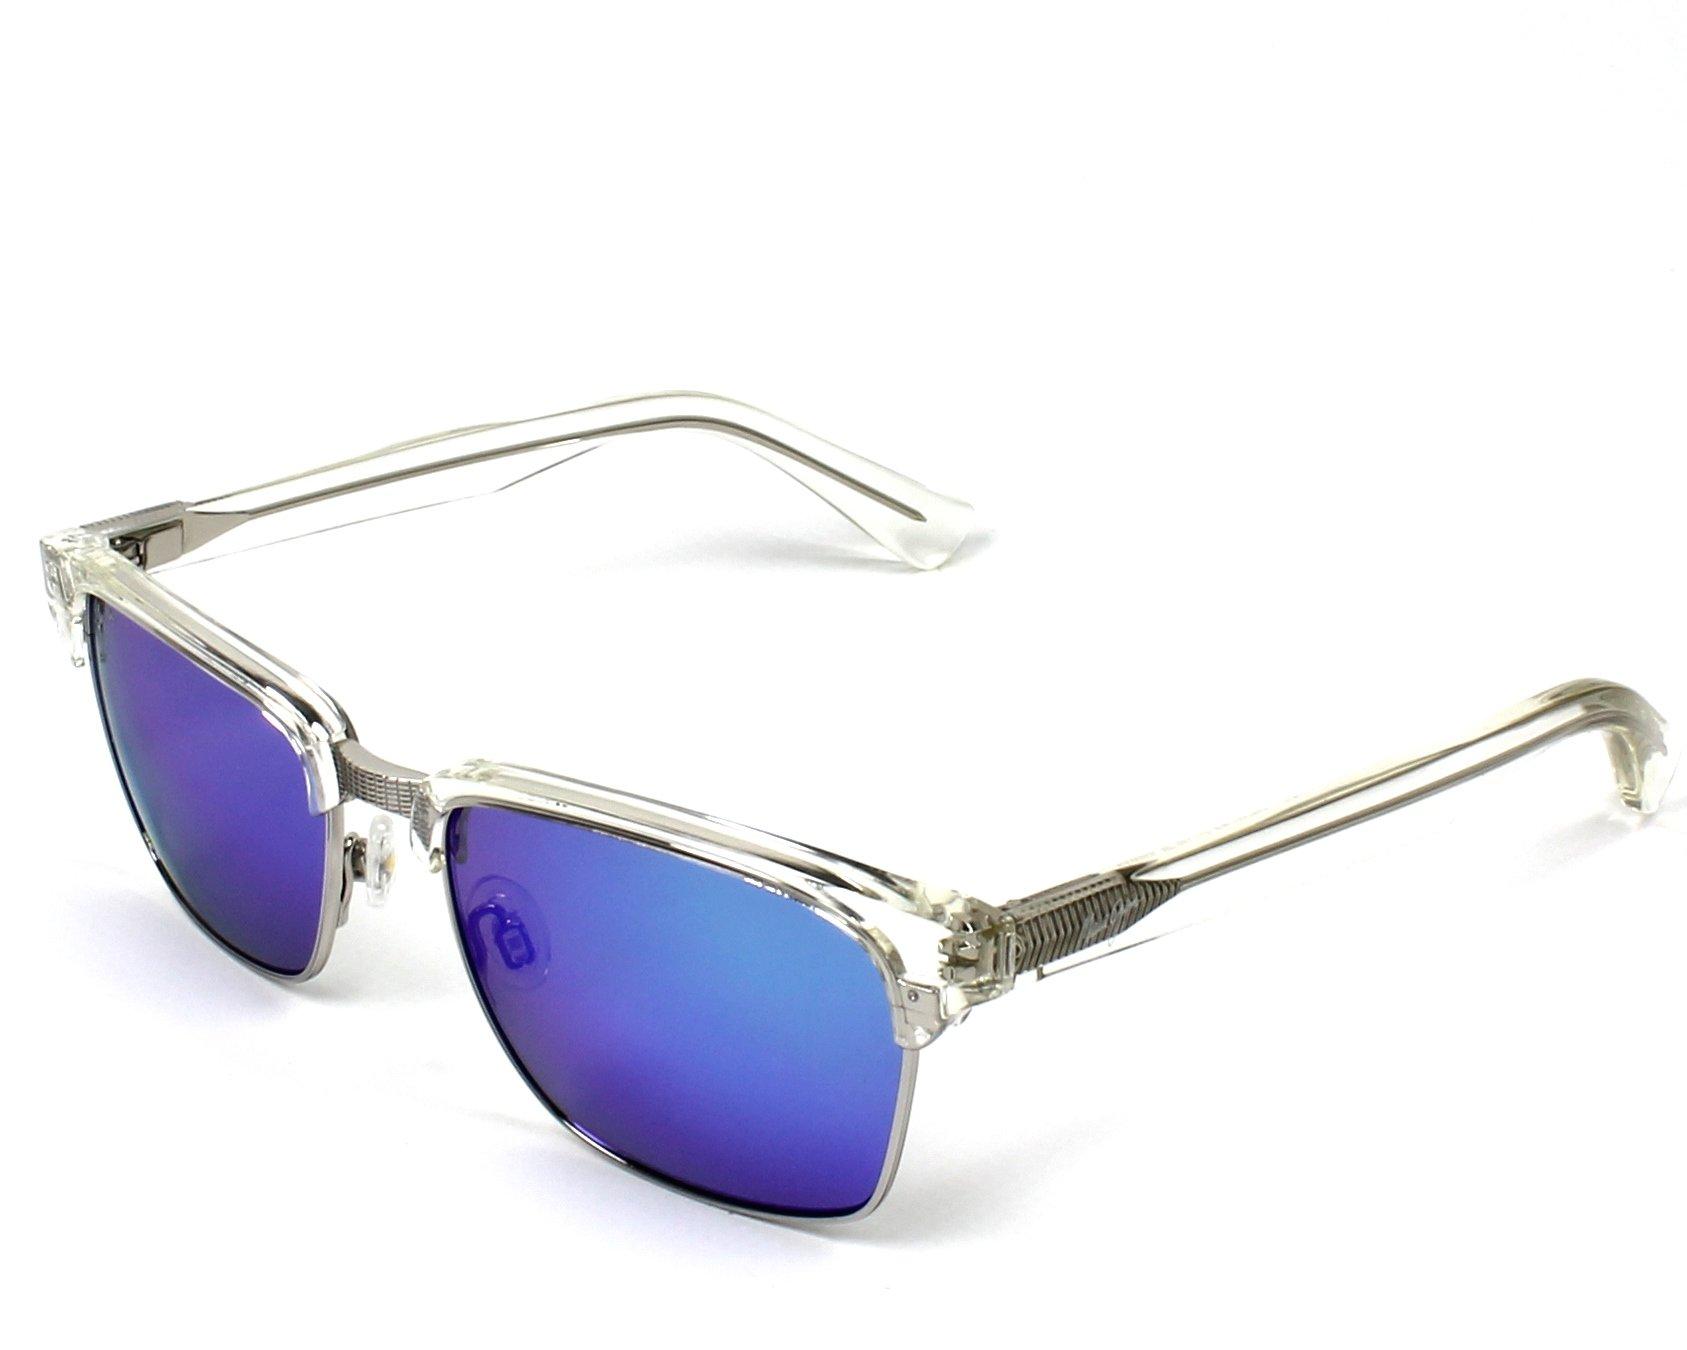 90c64a4c9b9 Sunglasses Maui Jim B-257 05CR - Silver Crystal profile view